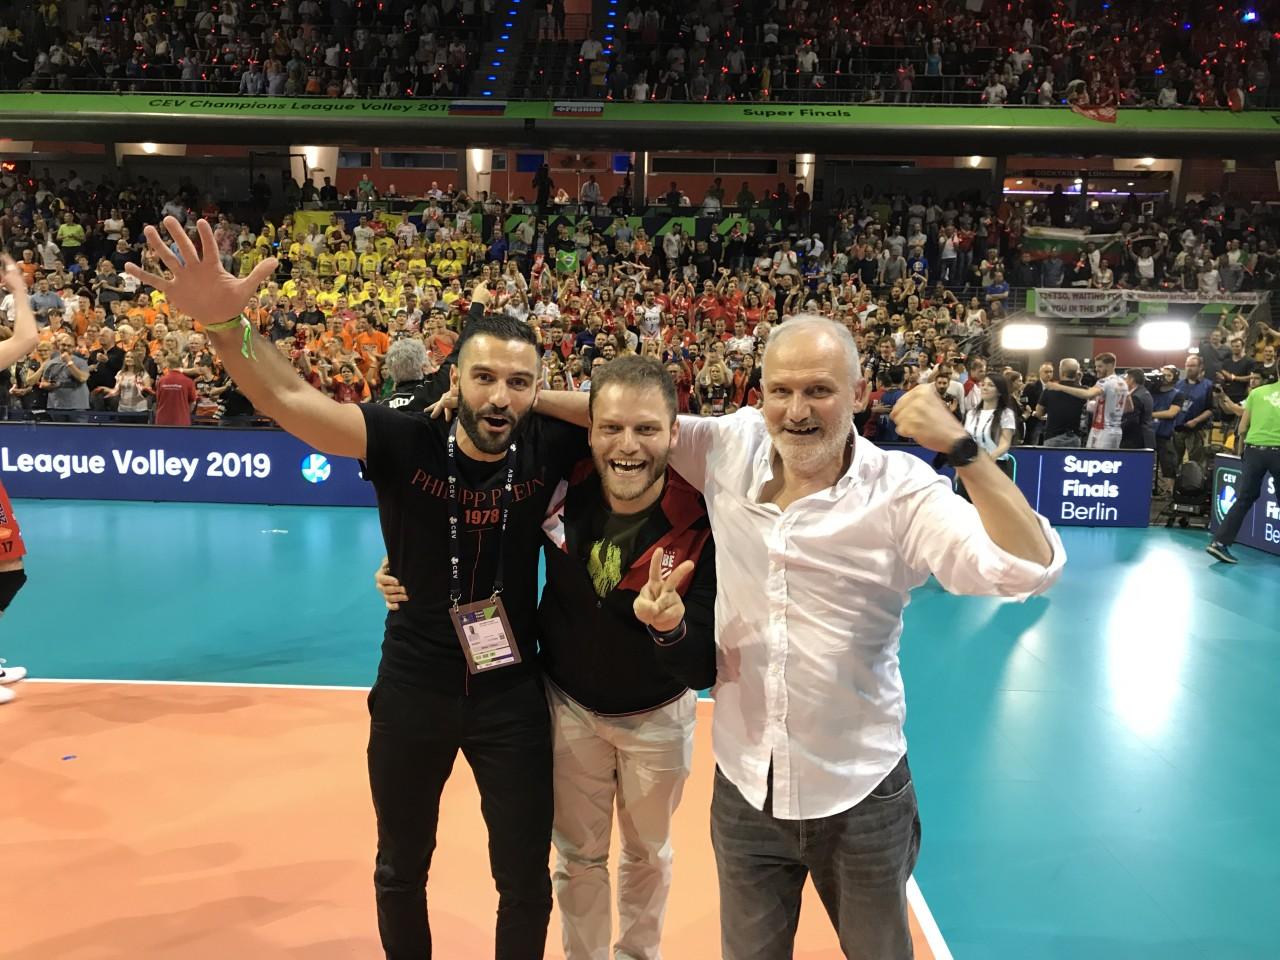 Volley, Civitanova campione a Berlino: battuta Kazan 3-1